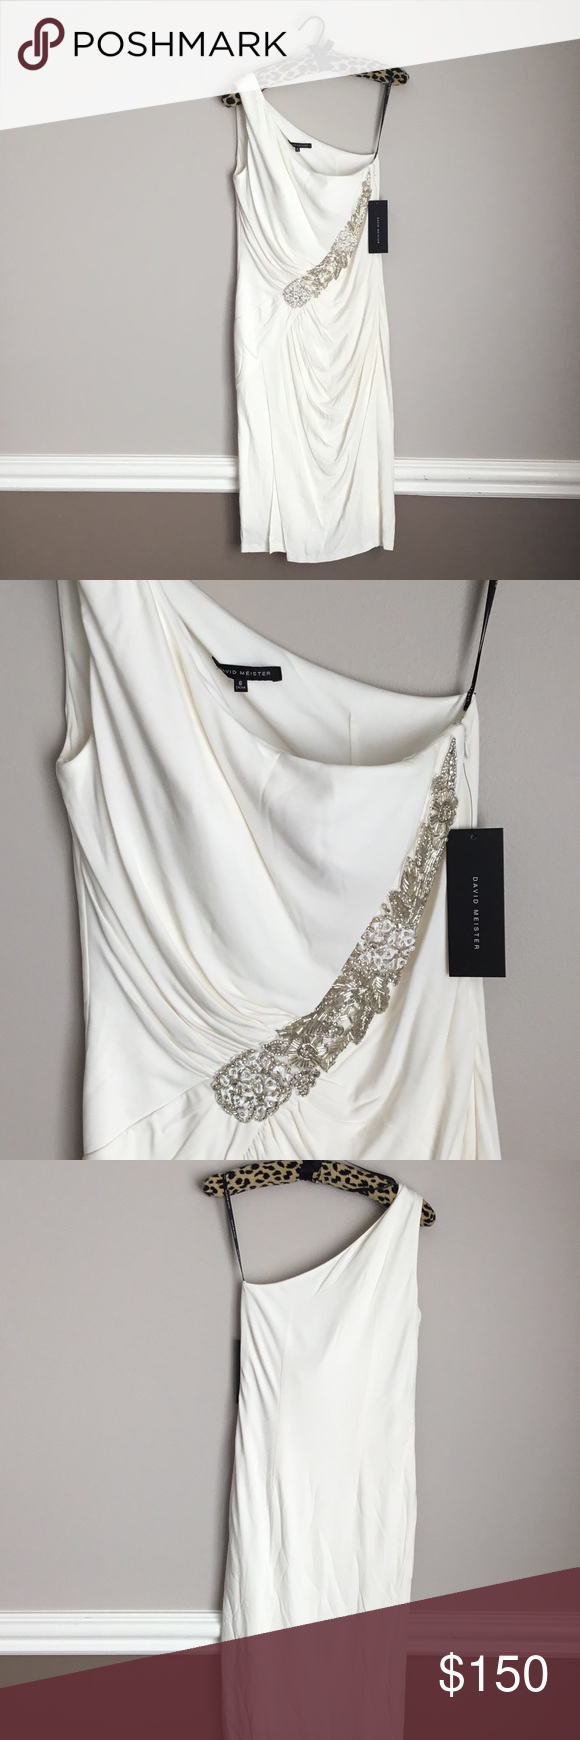 Neimans David Meister one shoulder Grecian gown NWT | Pinterest